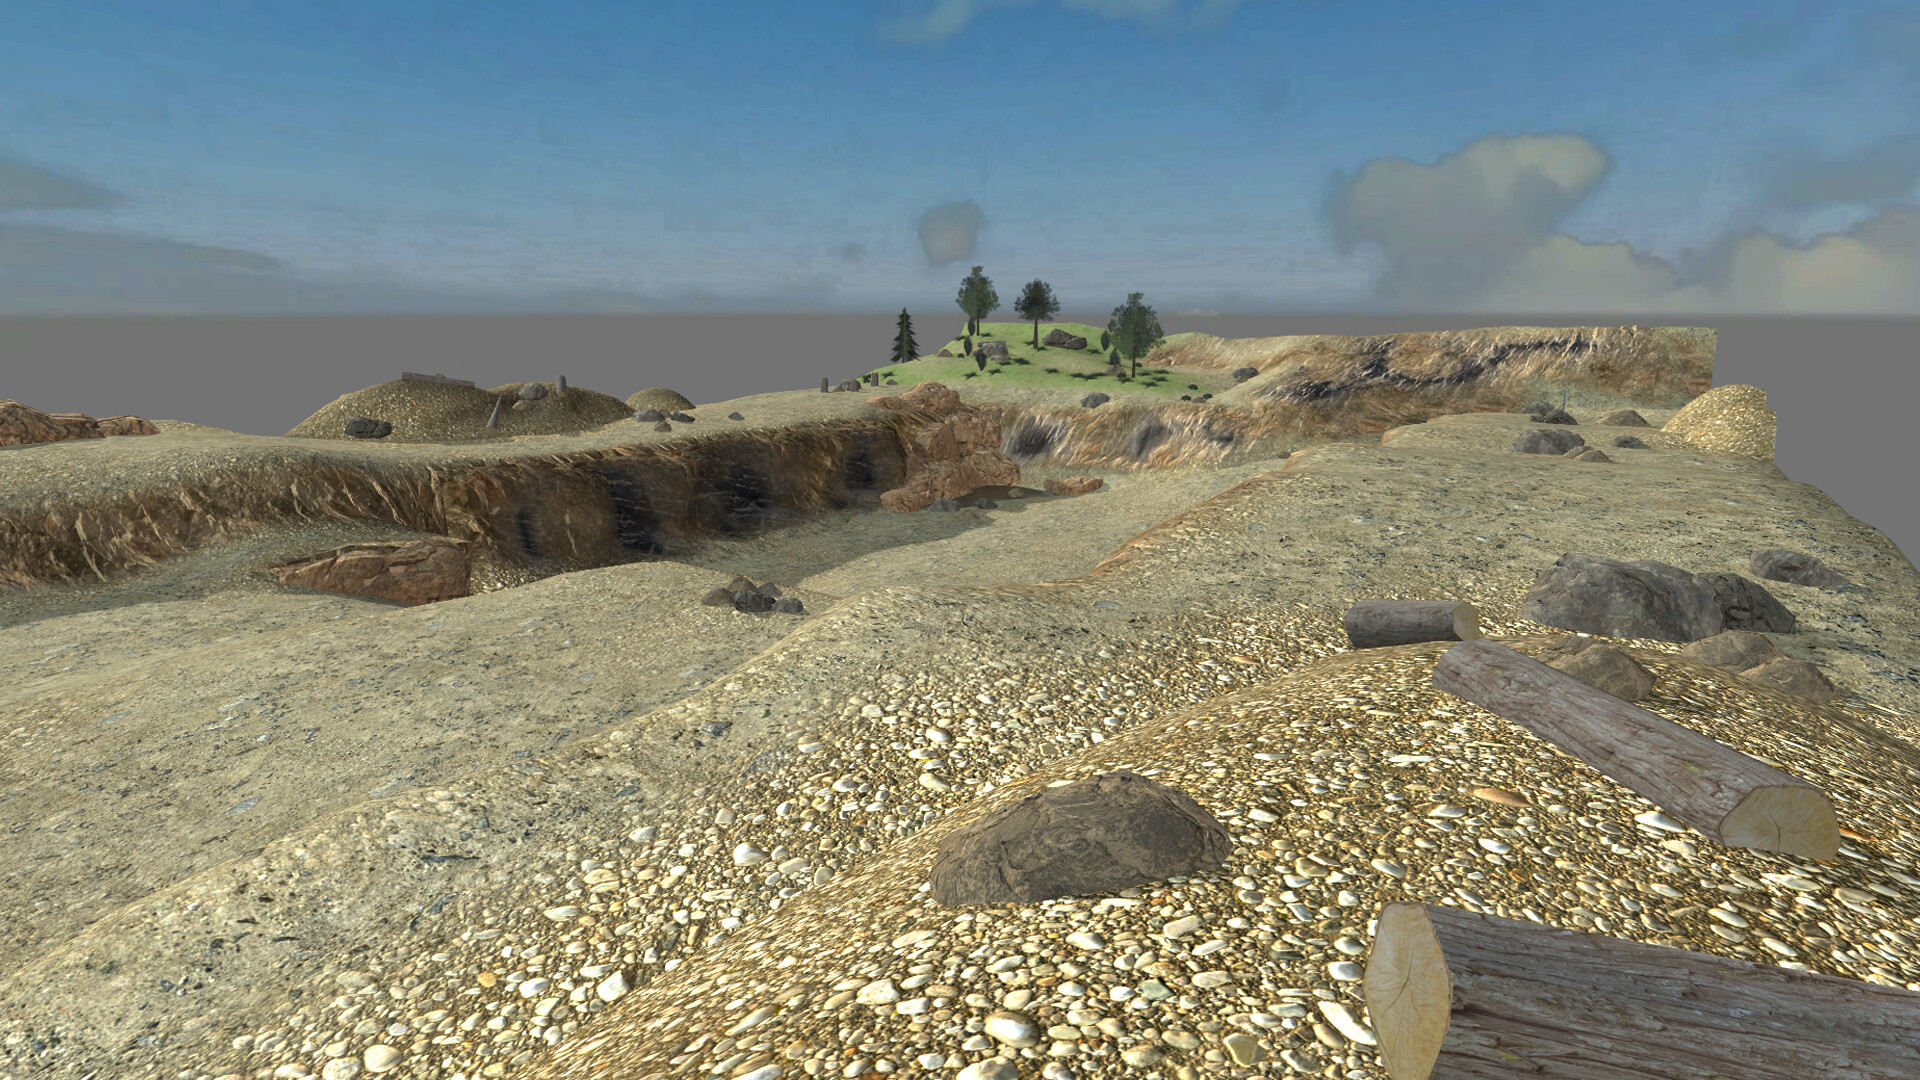 Jordan cameron quarry 26